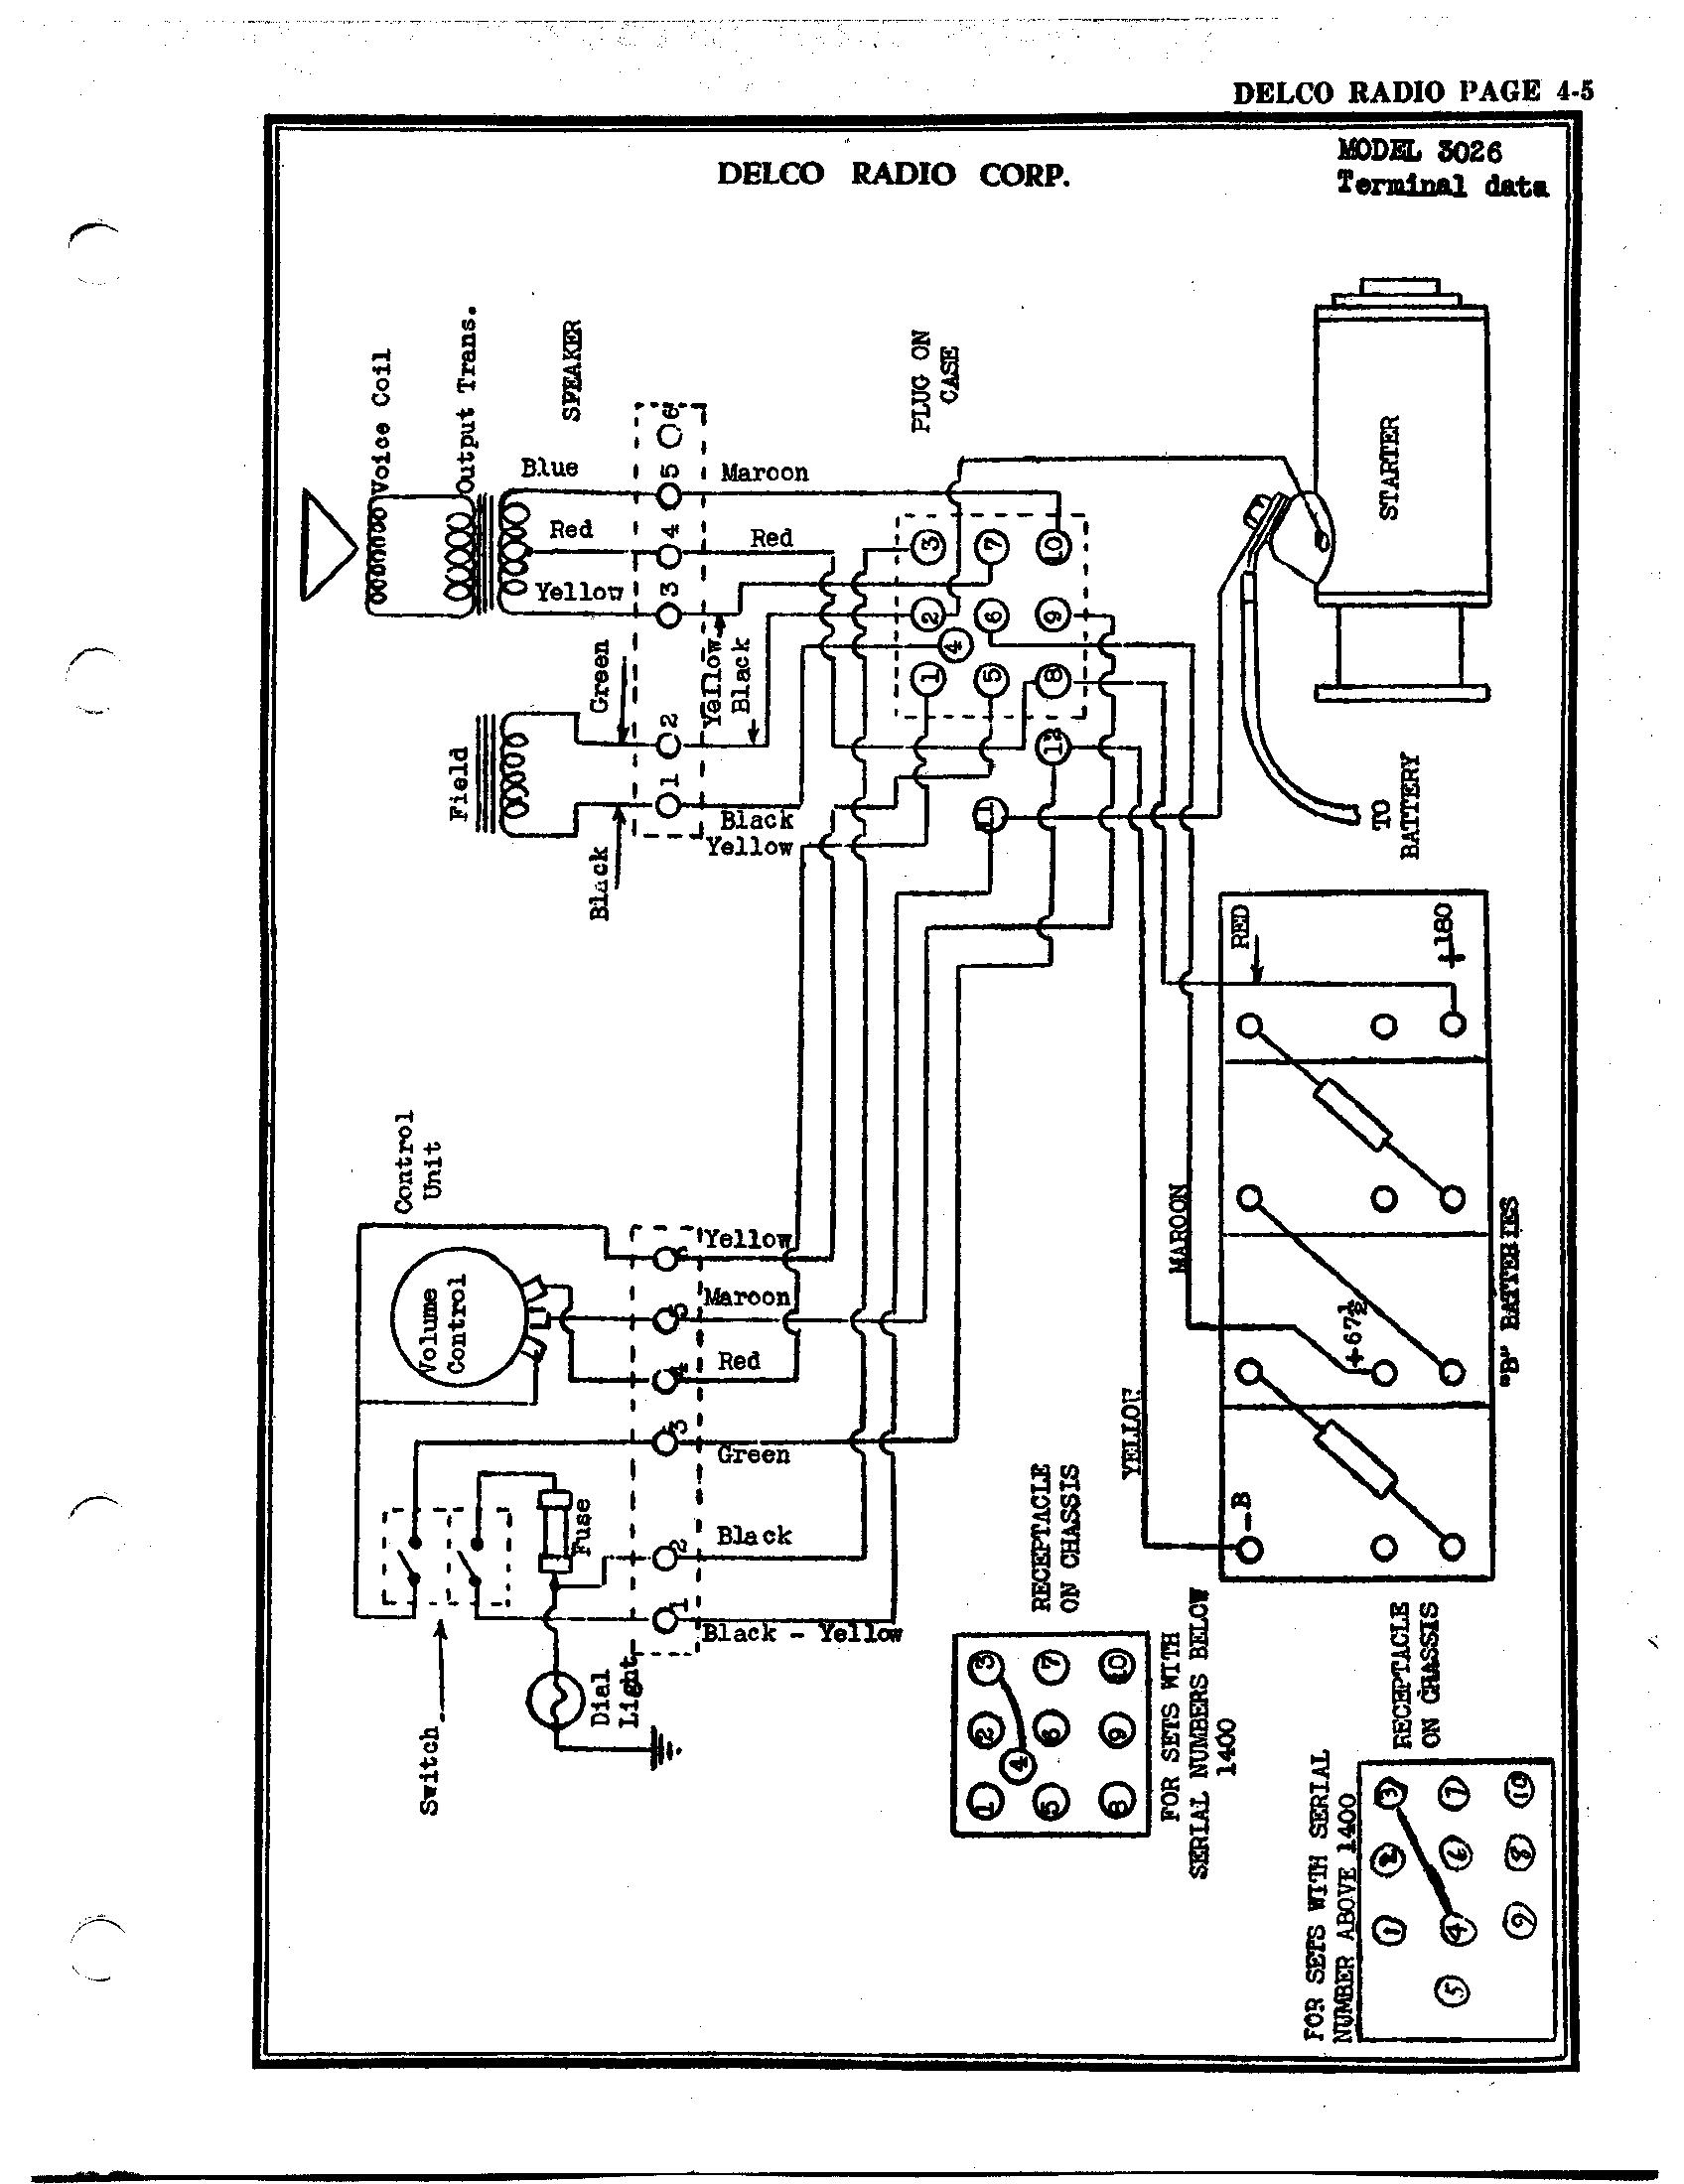 bmw z3 audio wiring diagram ford f350 diagrams 1999 radio harness imageresizertool com